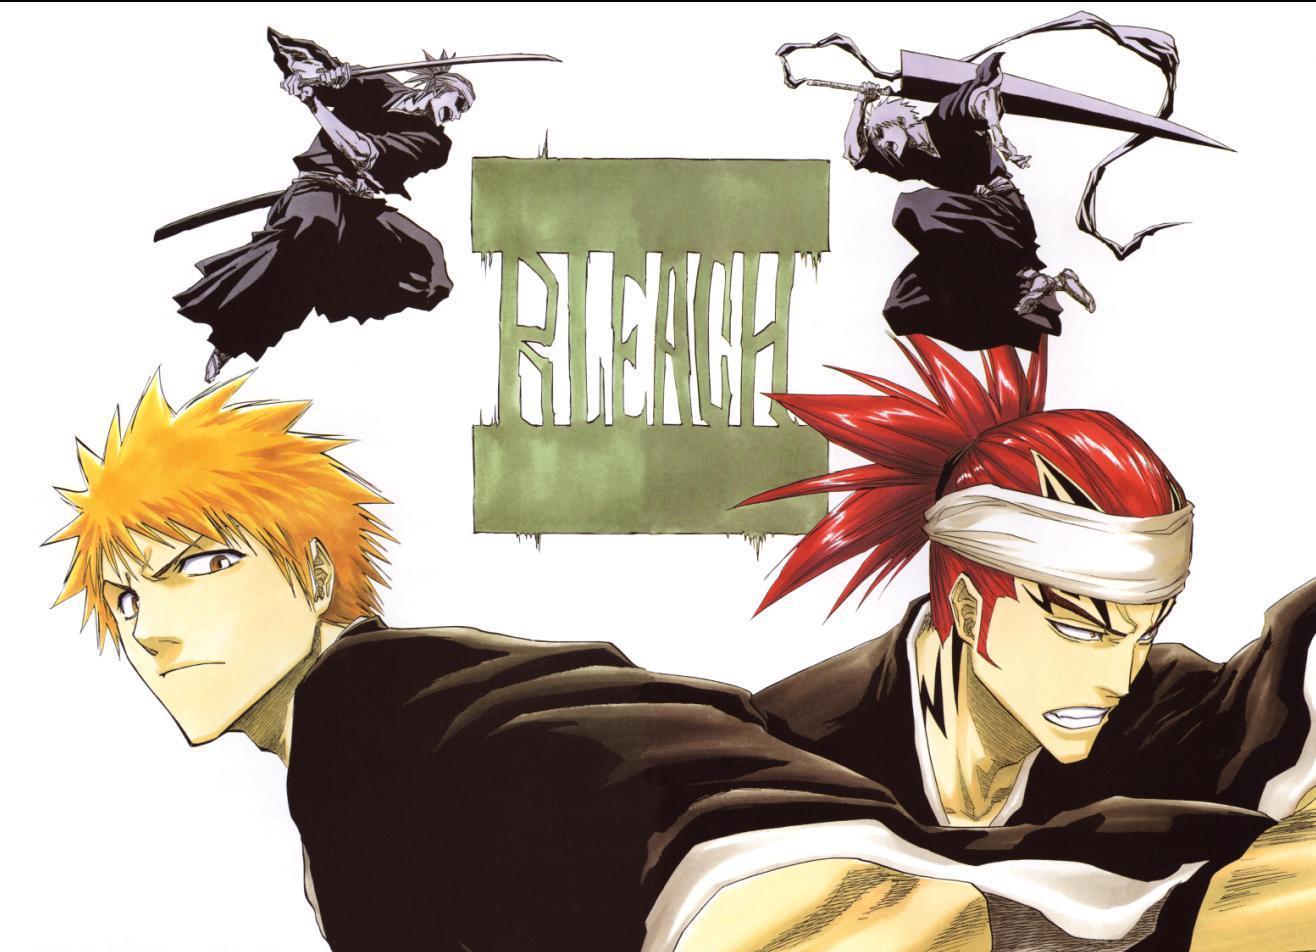 Ichigo and Renji - Bleach Anime Photo (16924127) - Fanpop